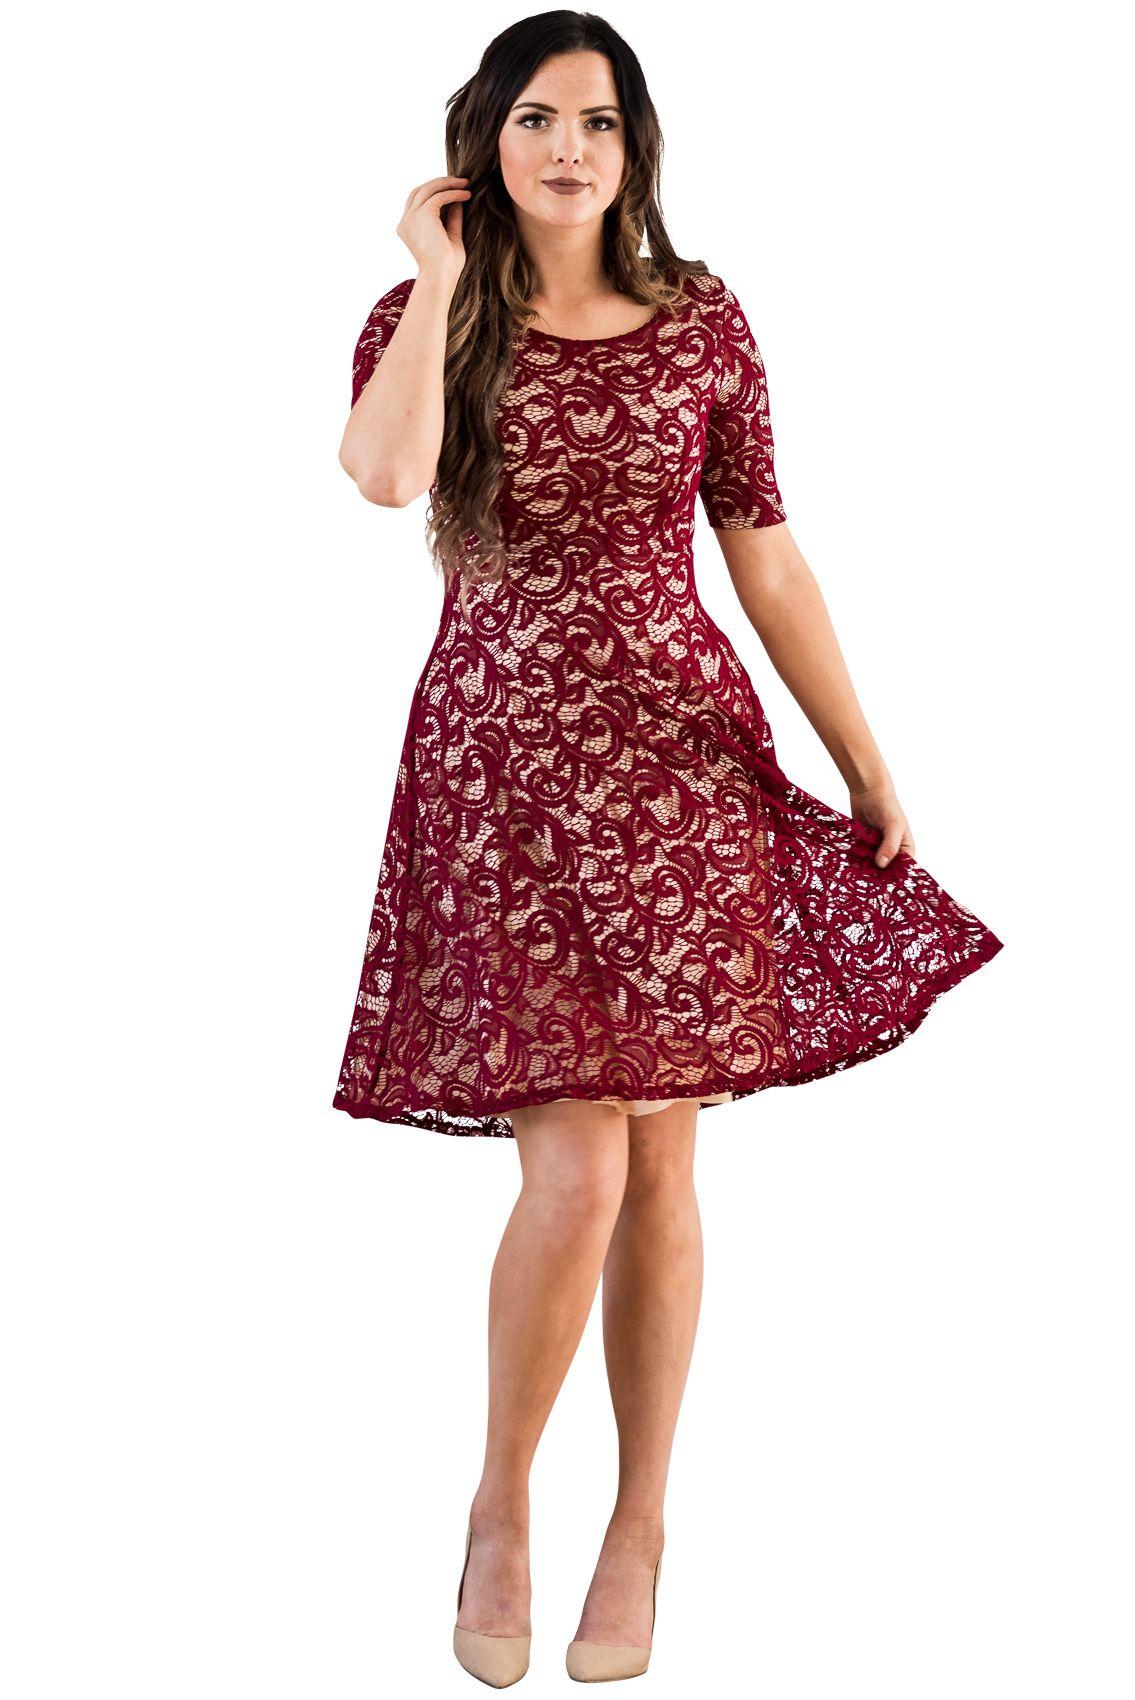 62686615b8570 Sloan Modest Bridesmaid Lace Dress in Burgundy w/Tan (Nude) Lining ...